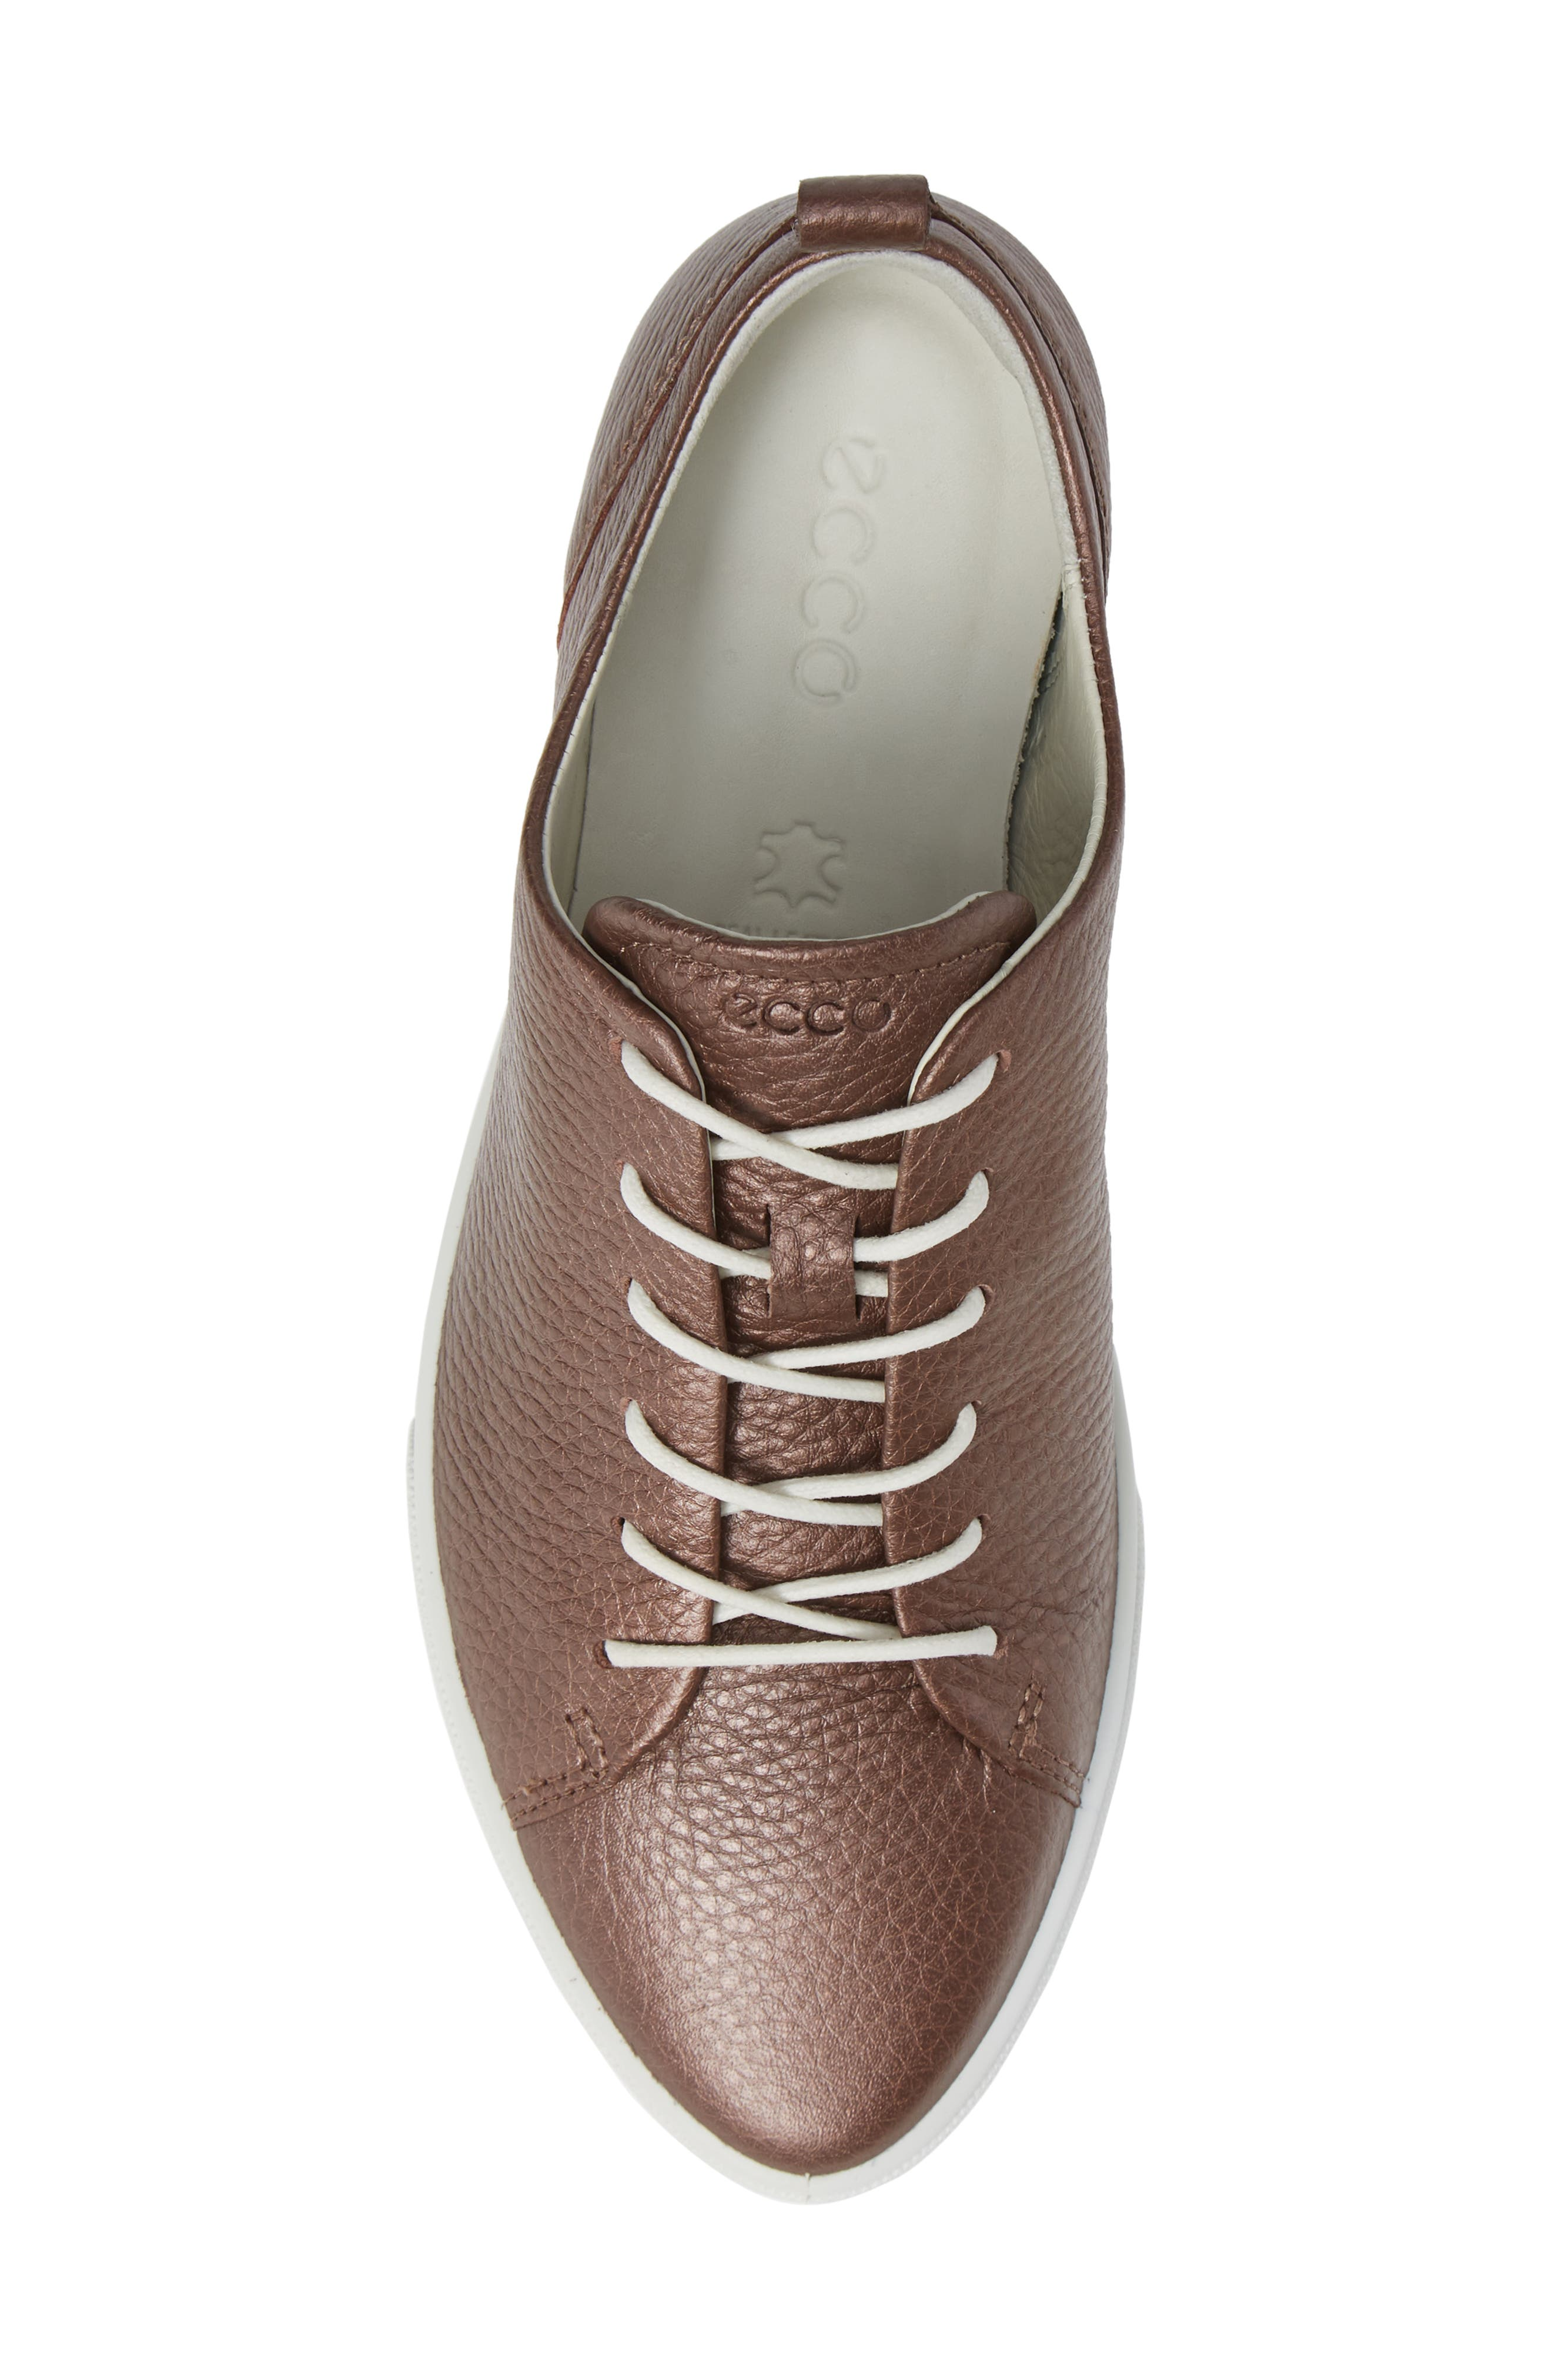 Gillian Sneaker,                             Alternate thumbnail 5, color,                             DEEP TAUPE/ BRONZE LEATHER